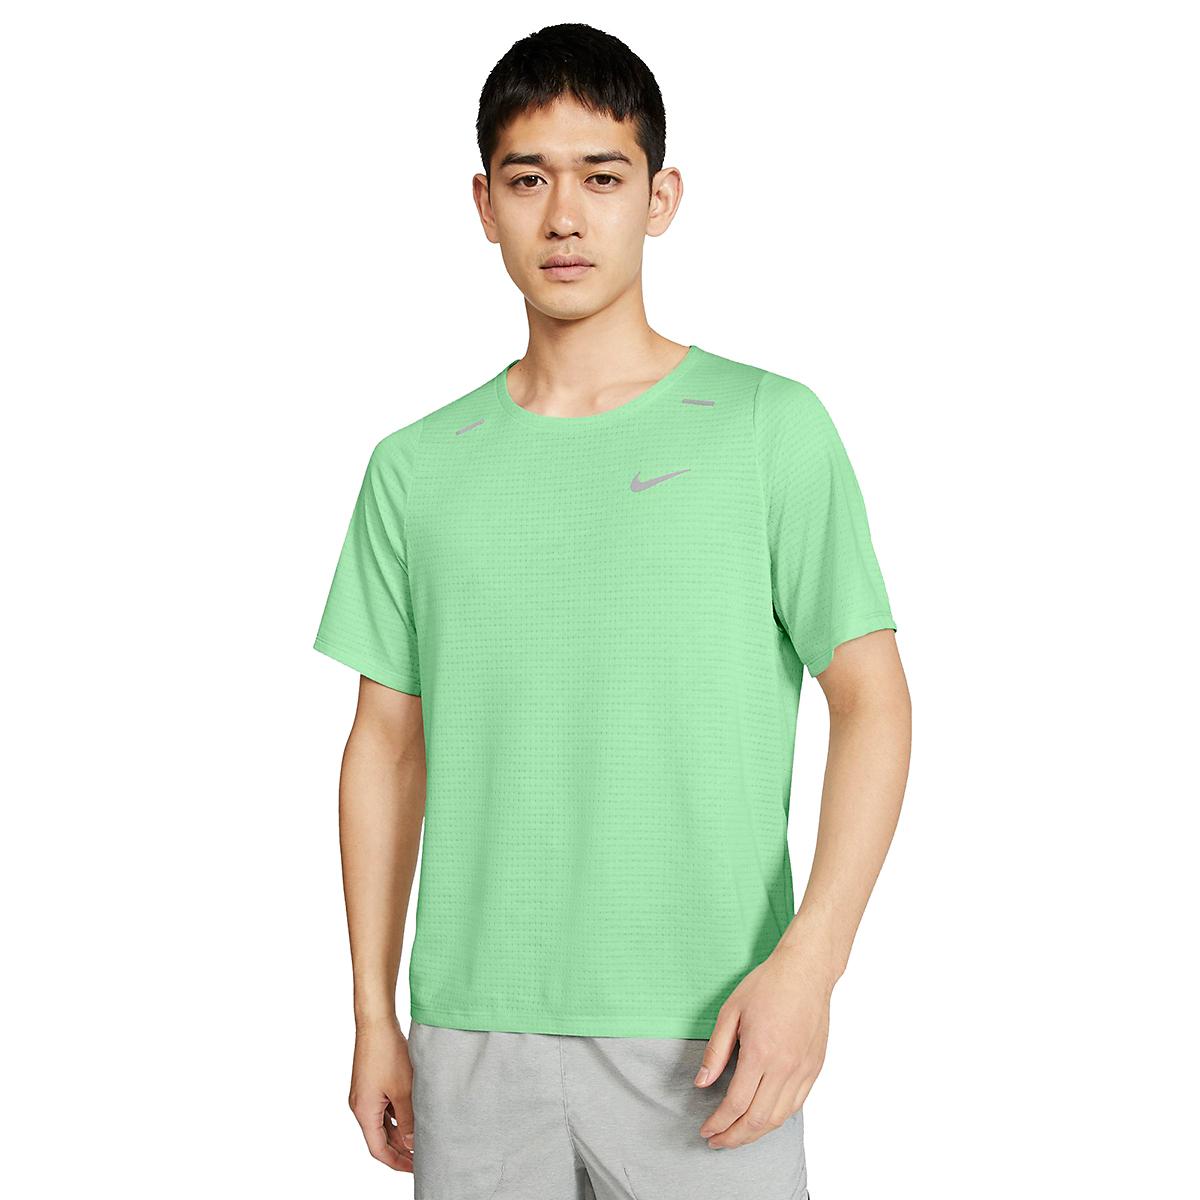 Men's Nike Rise 365 Short Sleeve  - Color: Cucumber Calm - Size: S, Cucumber Calm, large, image 1